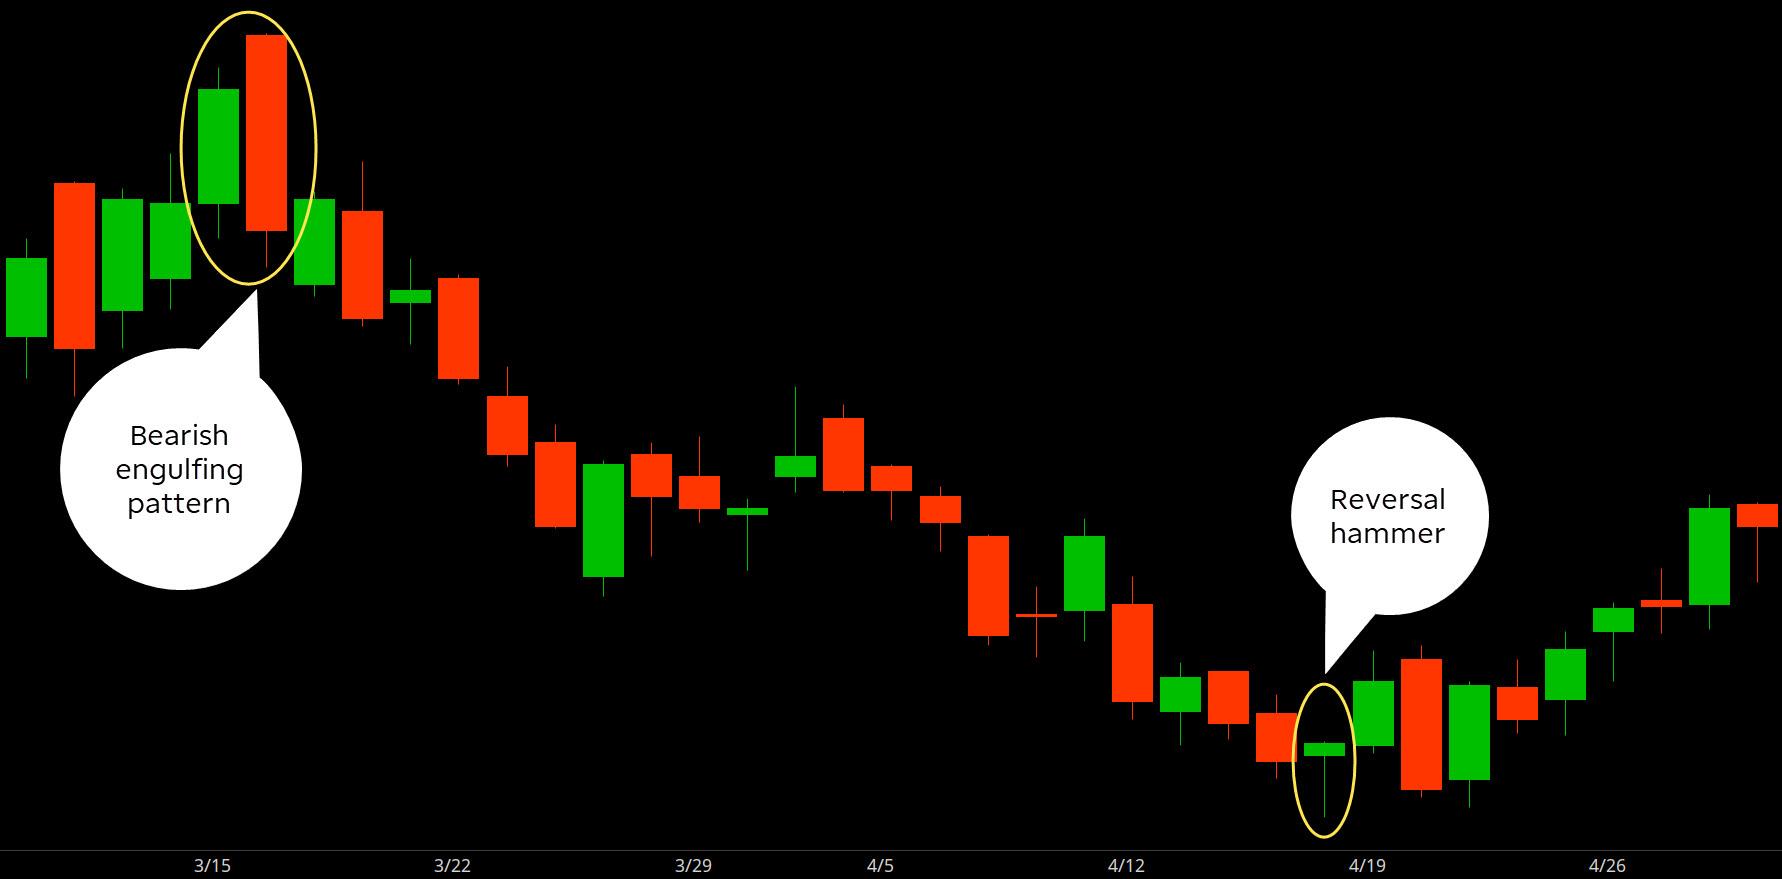 chart displaying reversal hammer and bearish engulfing candlestick patterns